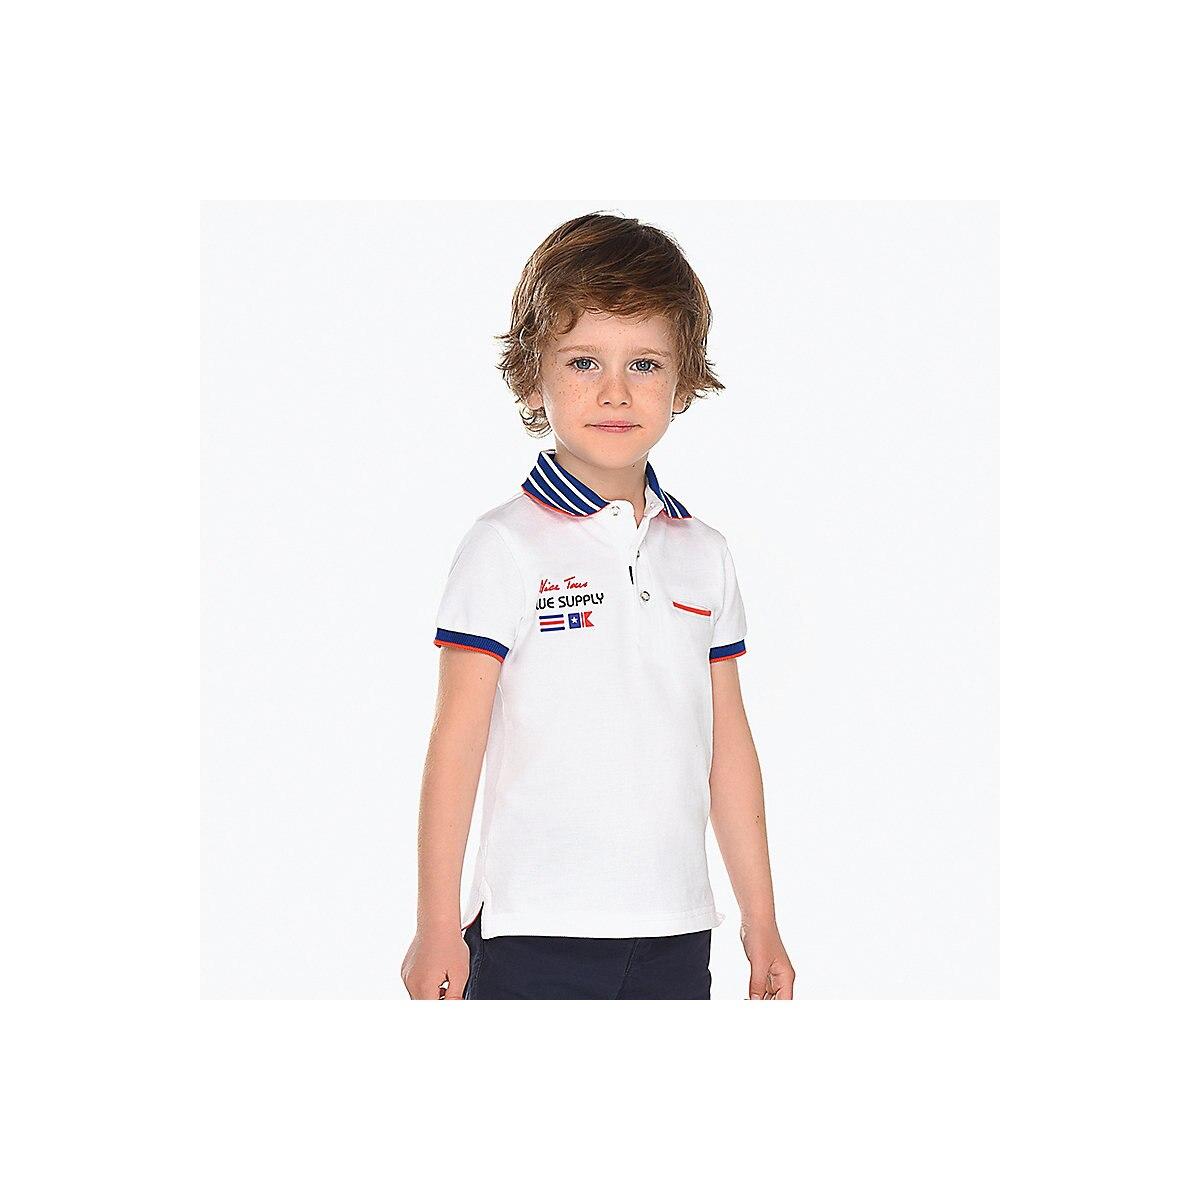 MAYORAL Polo Shirts 10685201 children clothing t-shirt shirt the print for boys